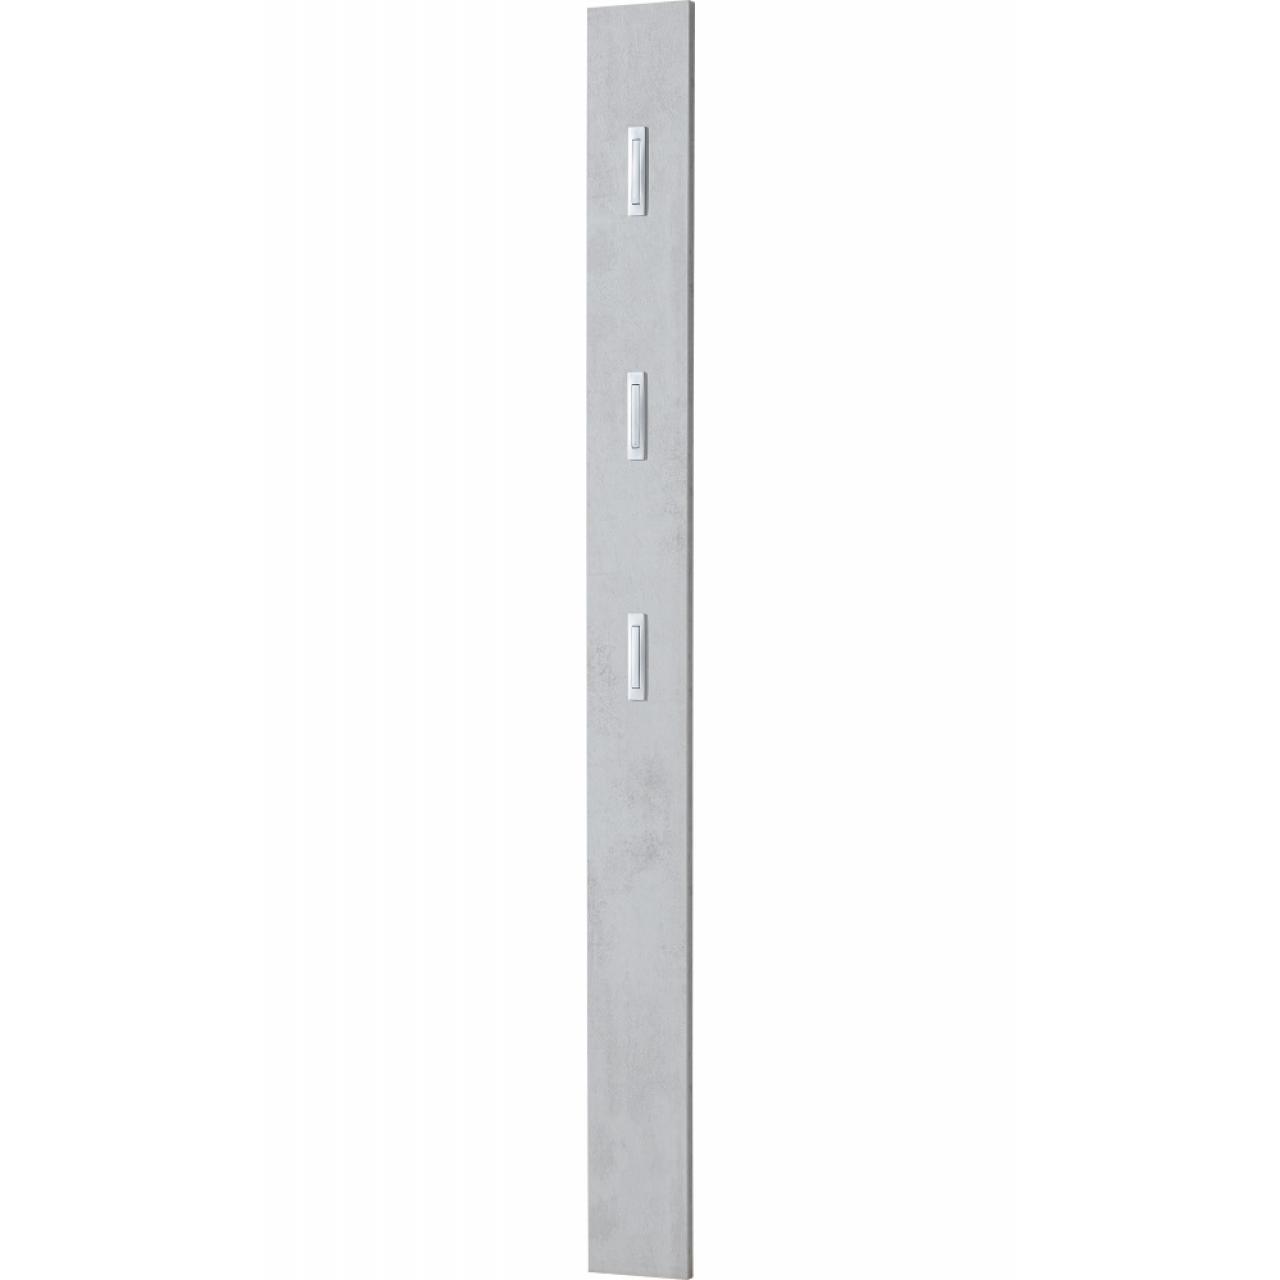 Garderobenpaneel - Beton Optik - 3 Kleiderhaken